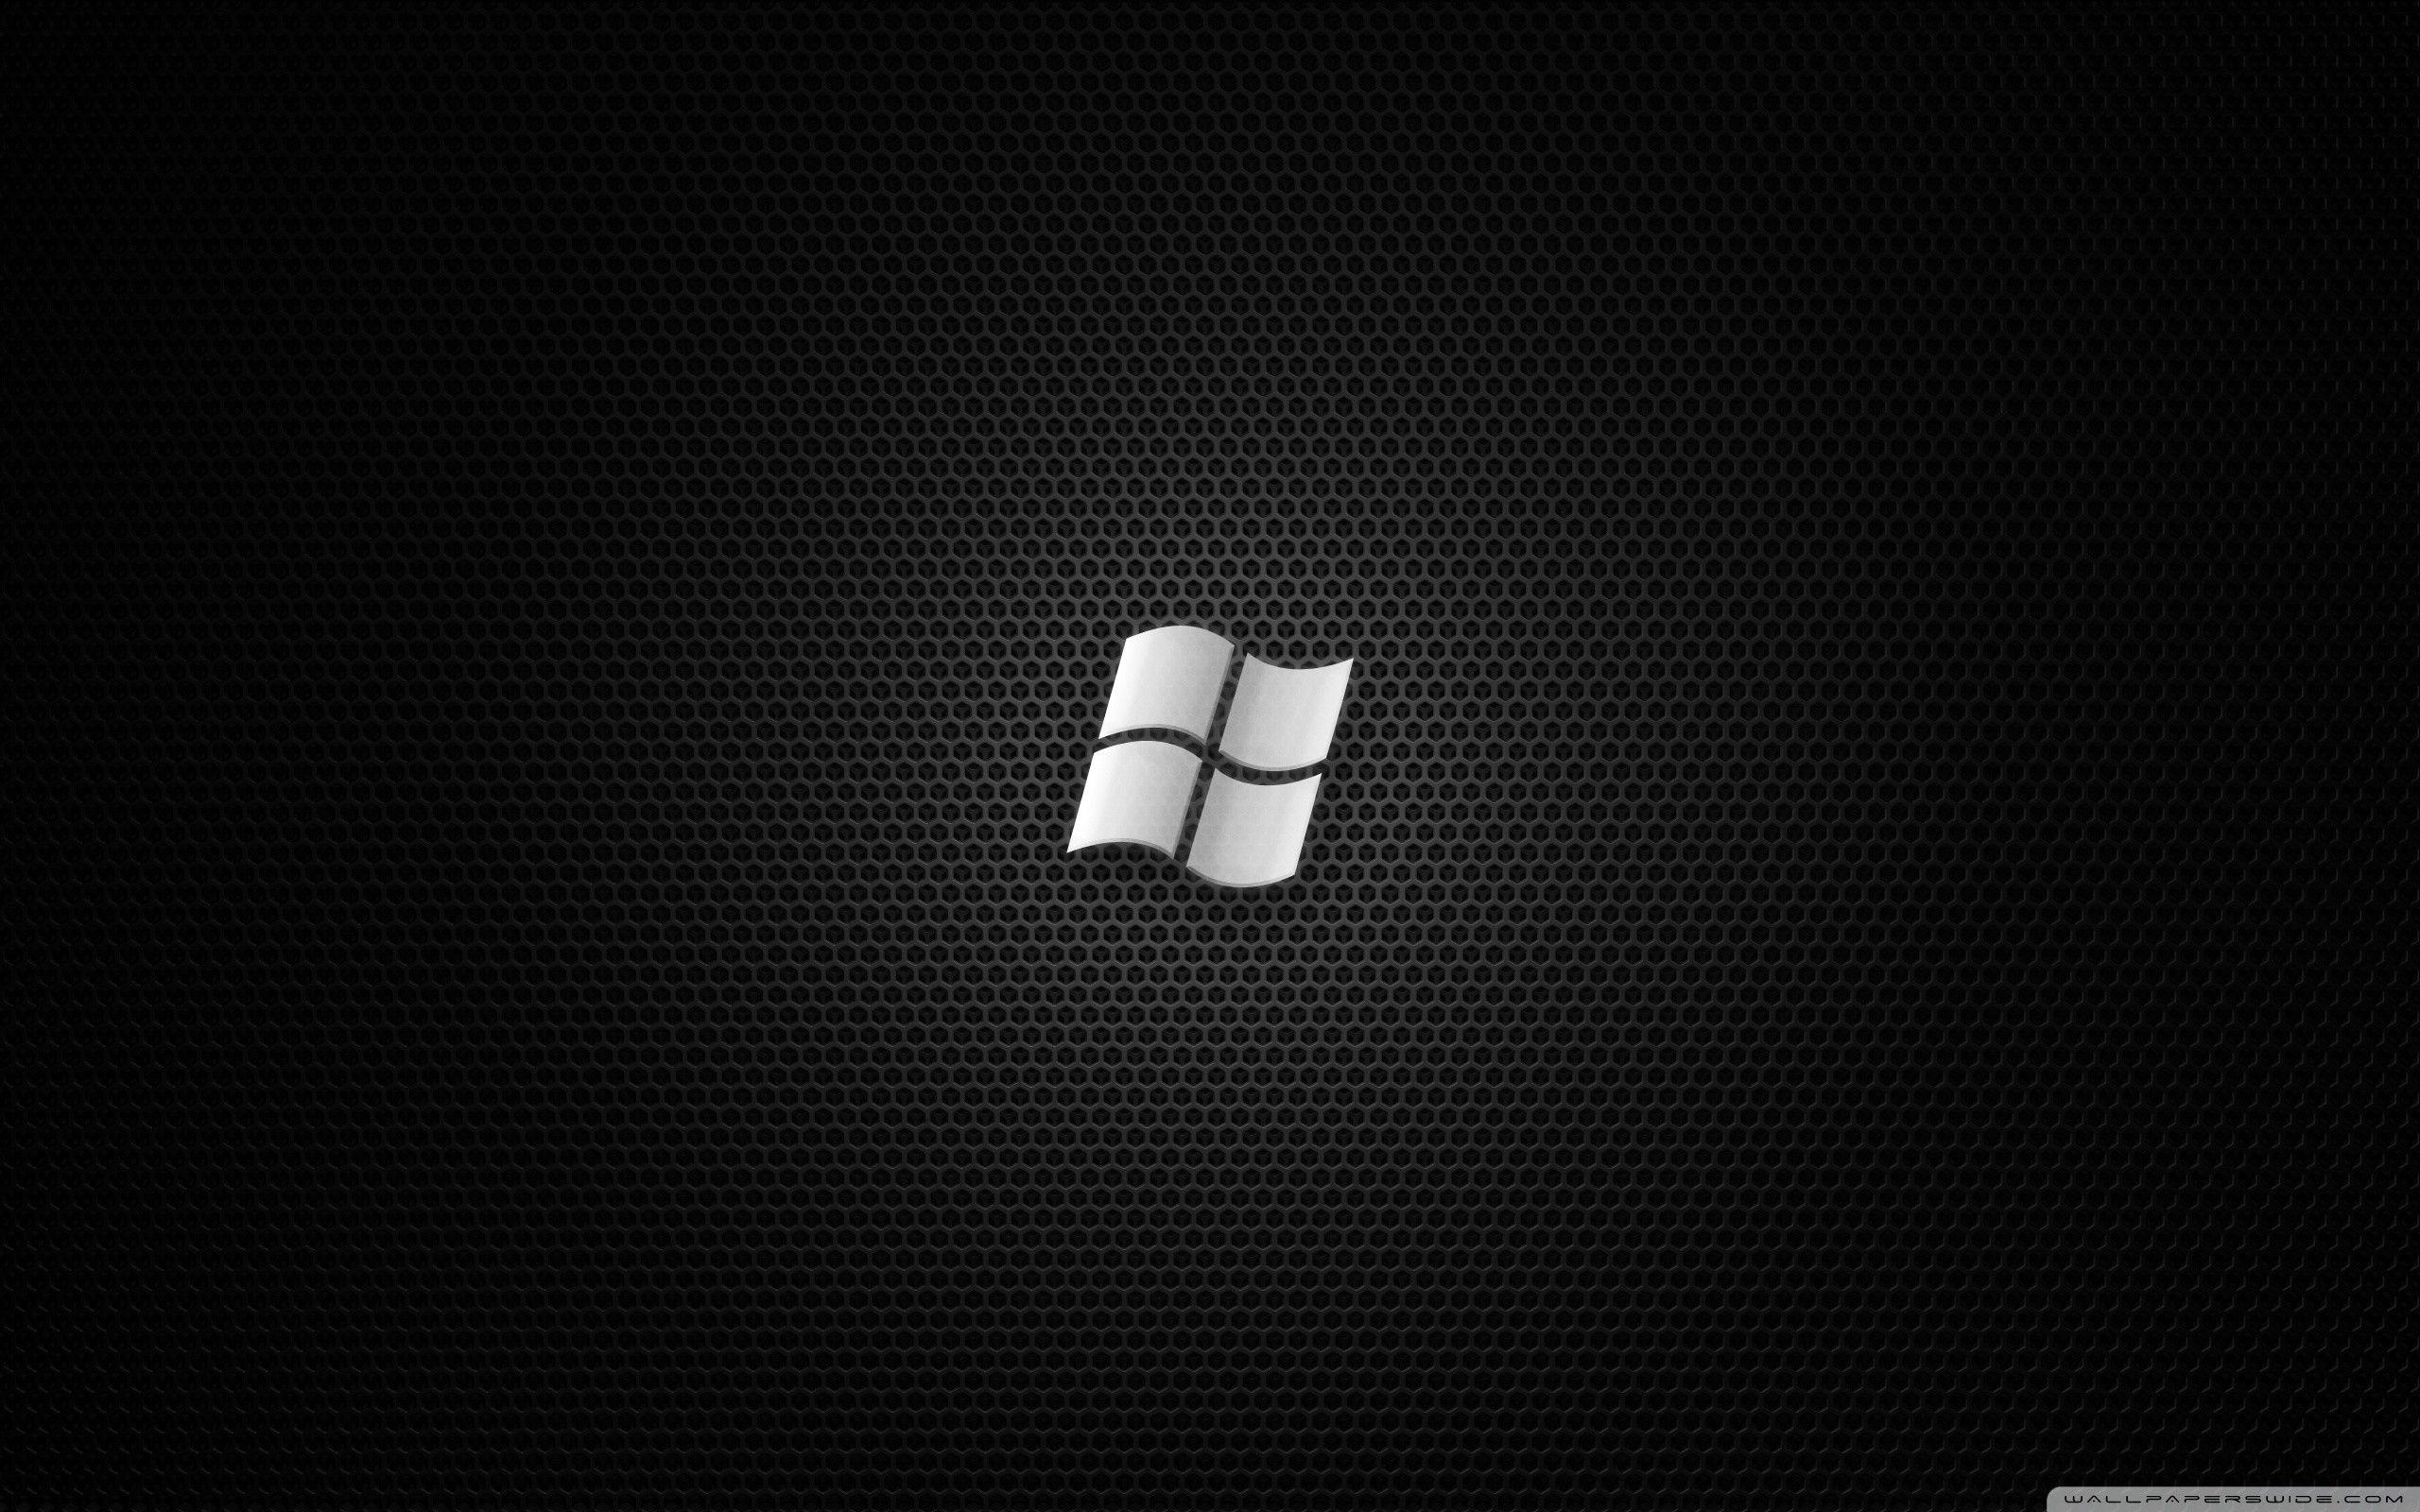 2560x1600 Wide Black Desktop Wallpaper Pc Black Wallpaper